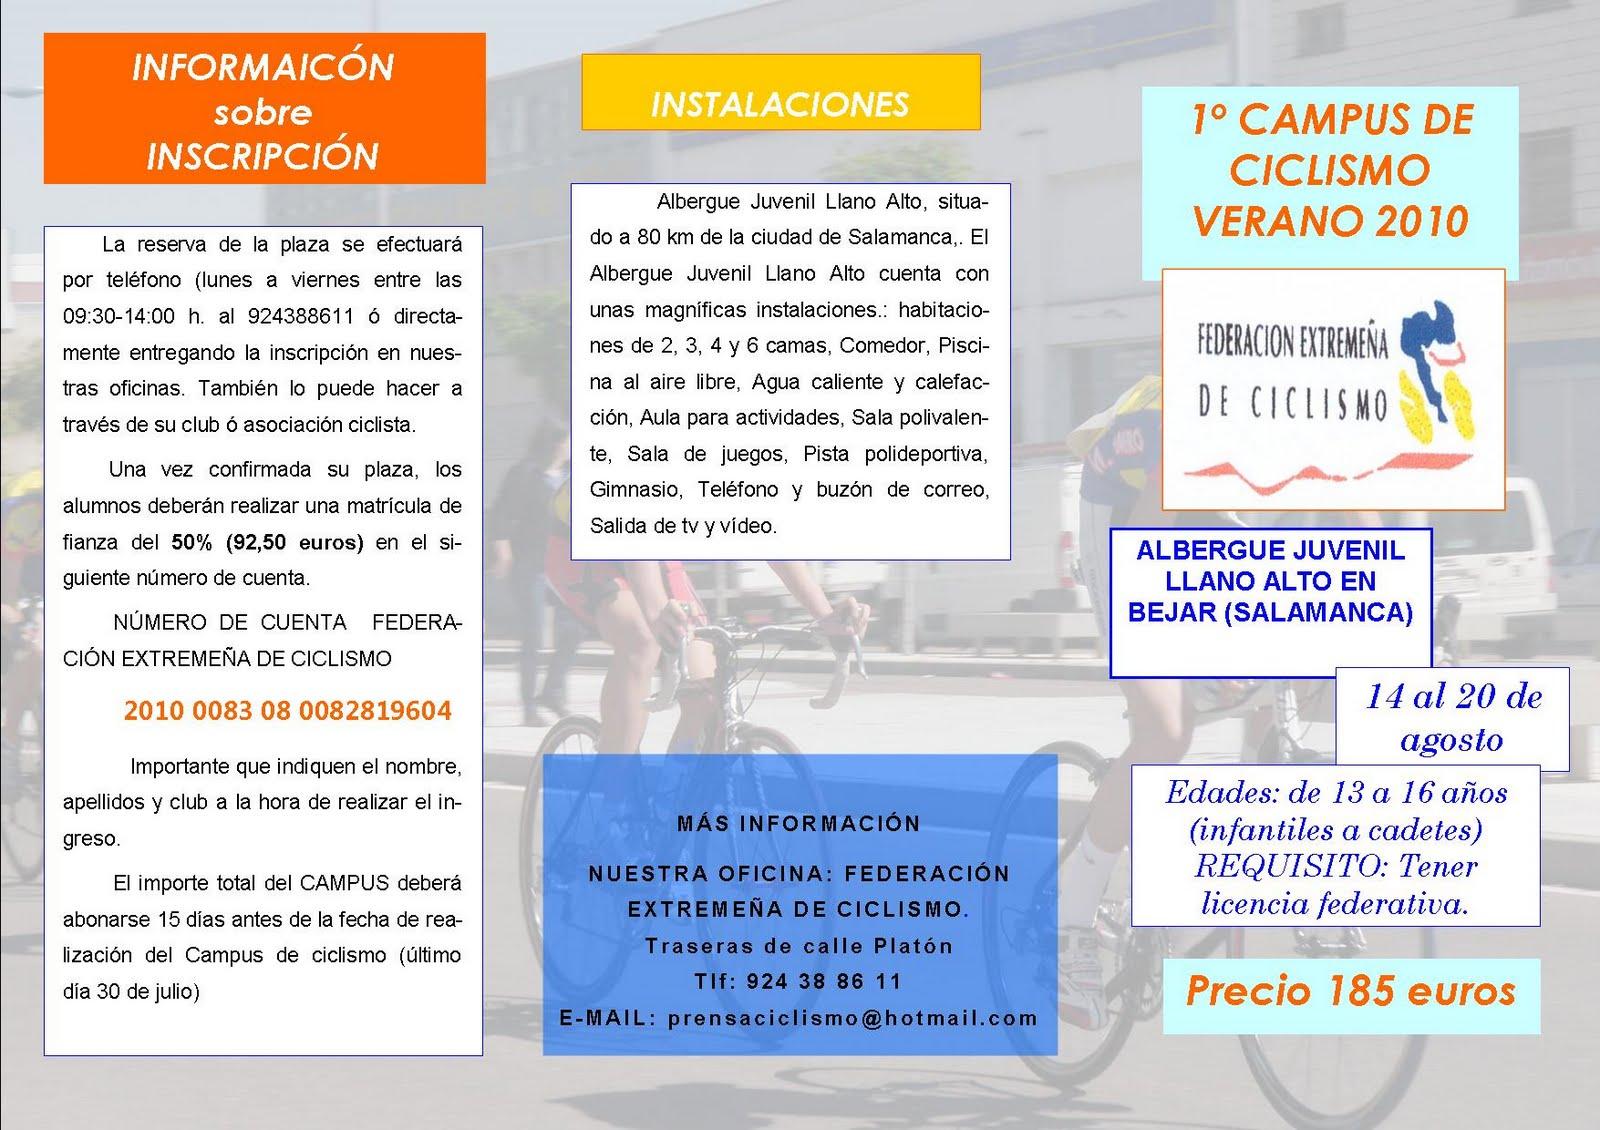 Federación Extremeña de Ciclismo: 1º CAMPUS DE CICLISMO ... - photo#44